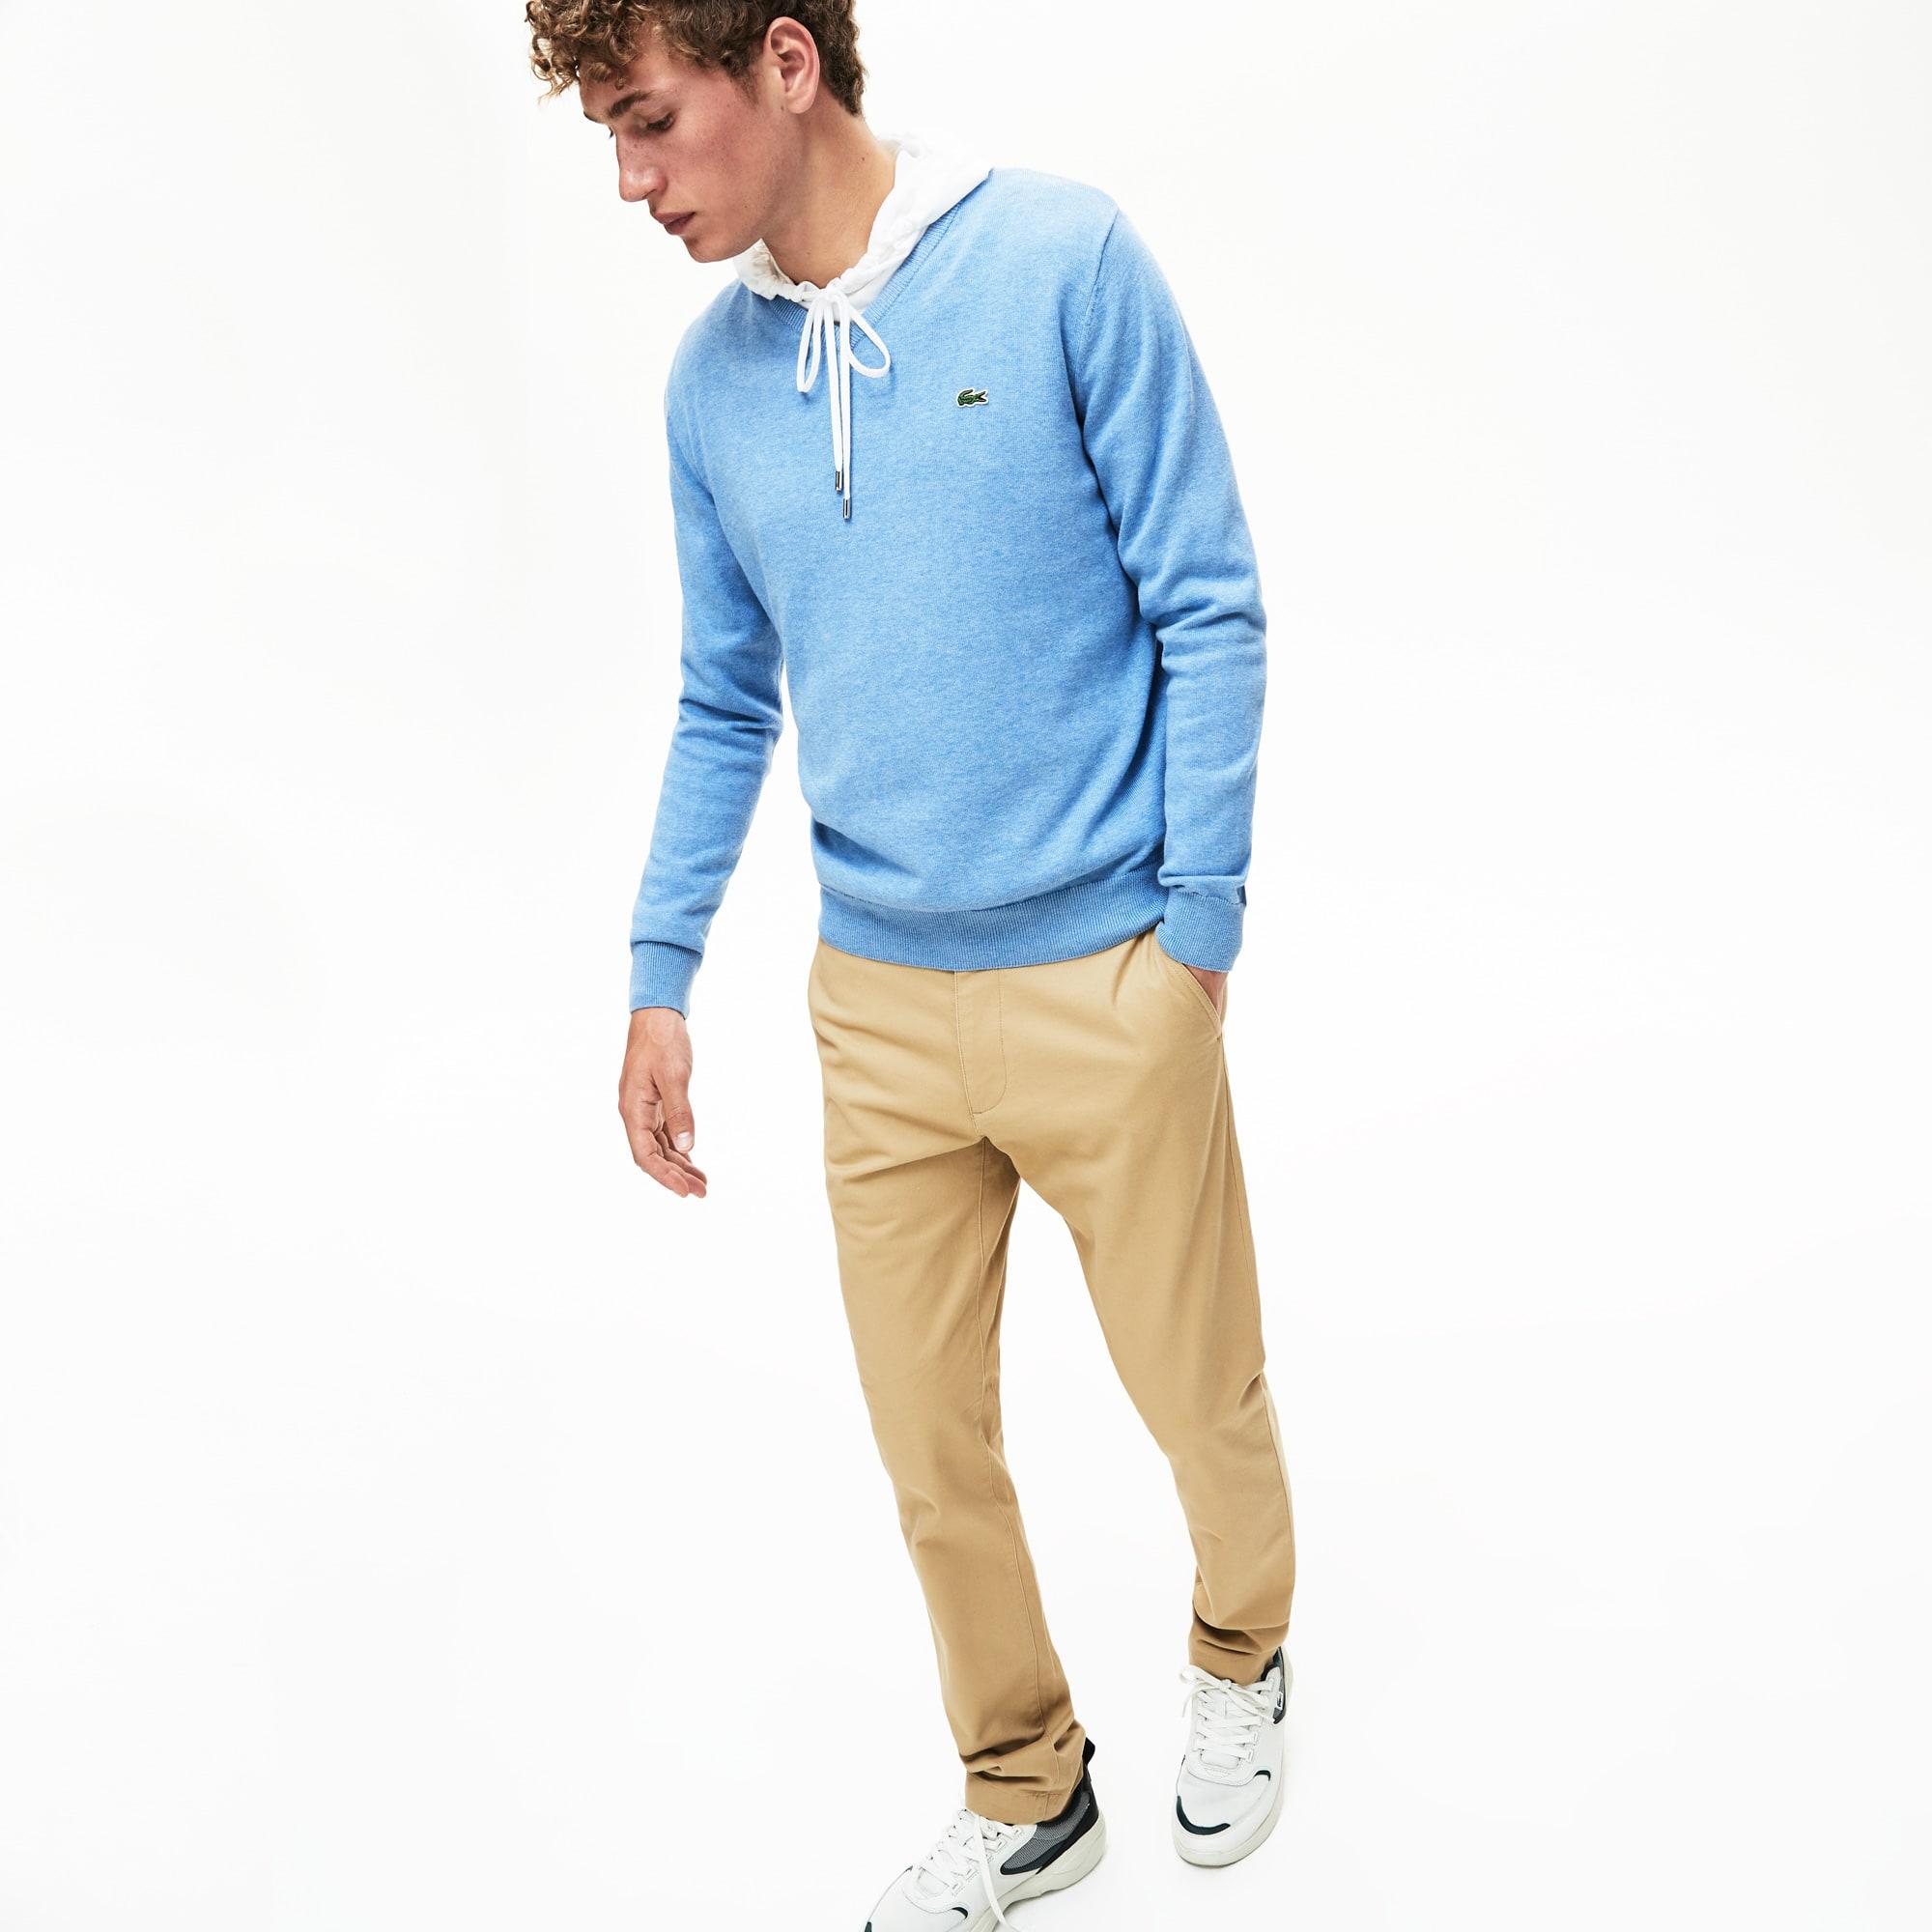 3da3f41ca65a + 2 colors · Men s Regular Fit Cotton Gabardine Chino Pants